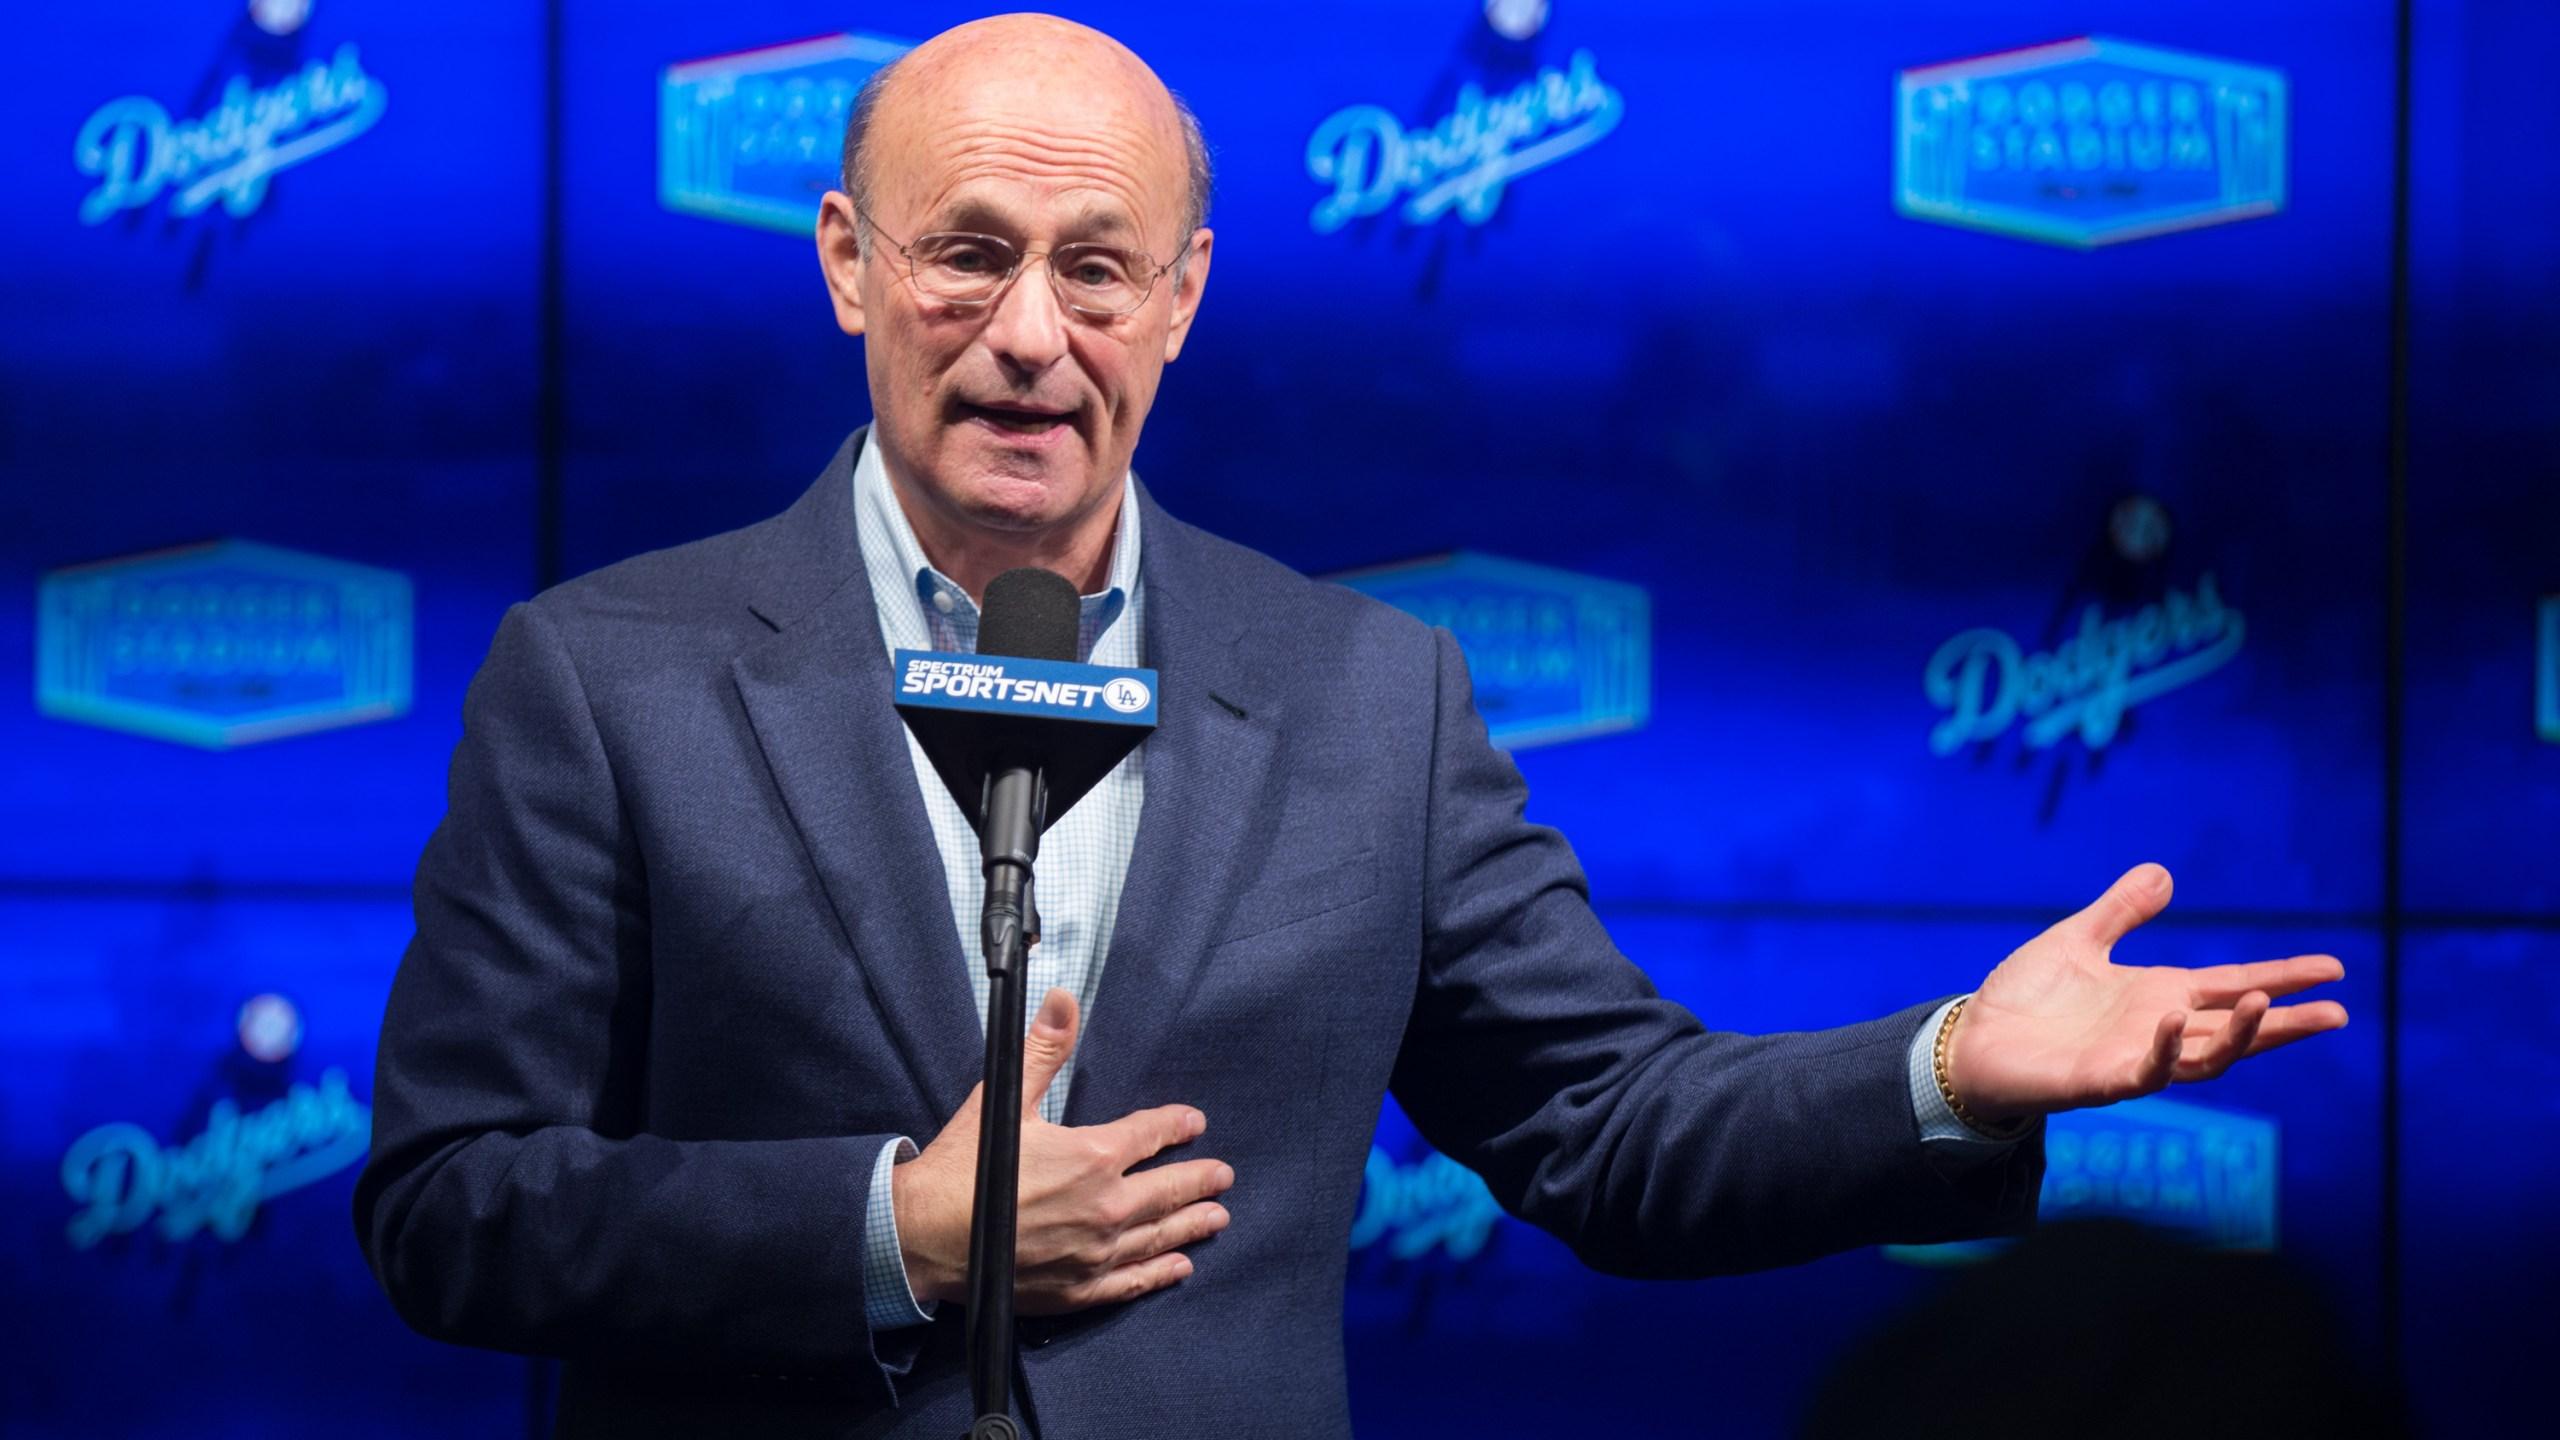 President of the Los Angeles Dodgers Stan Kasten speaks at Dodger Stadium on Jan. 5, 2017. (Emma McIntyre/Getty Images)